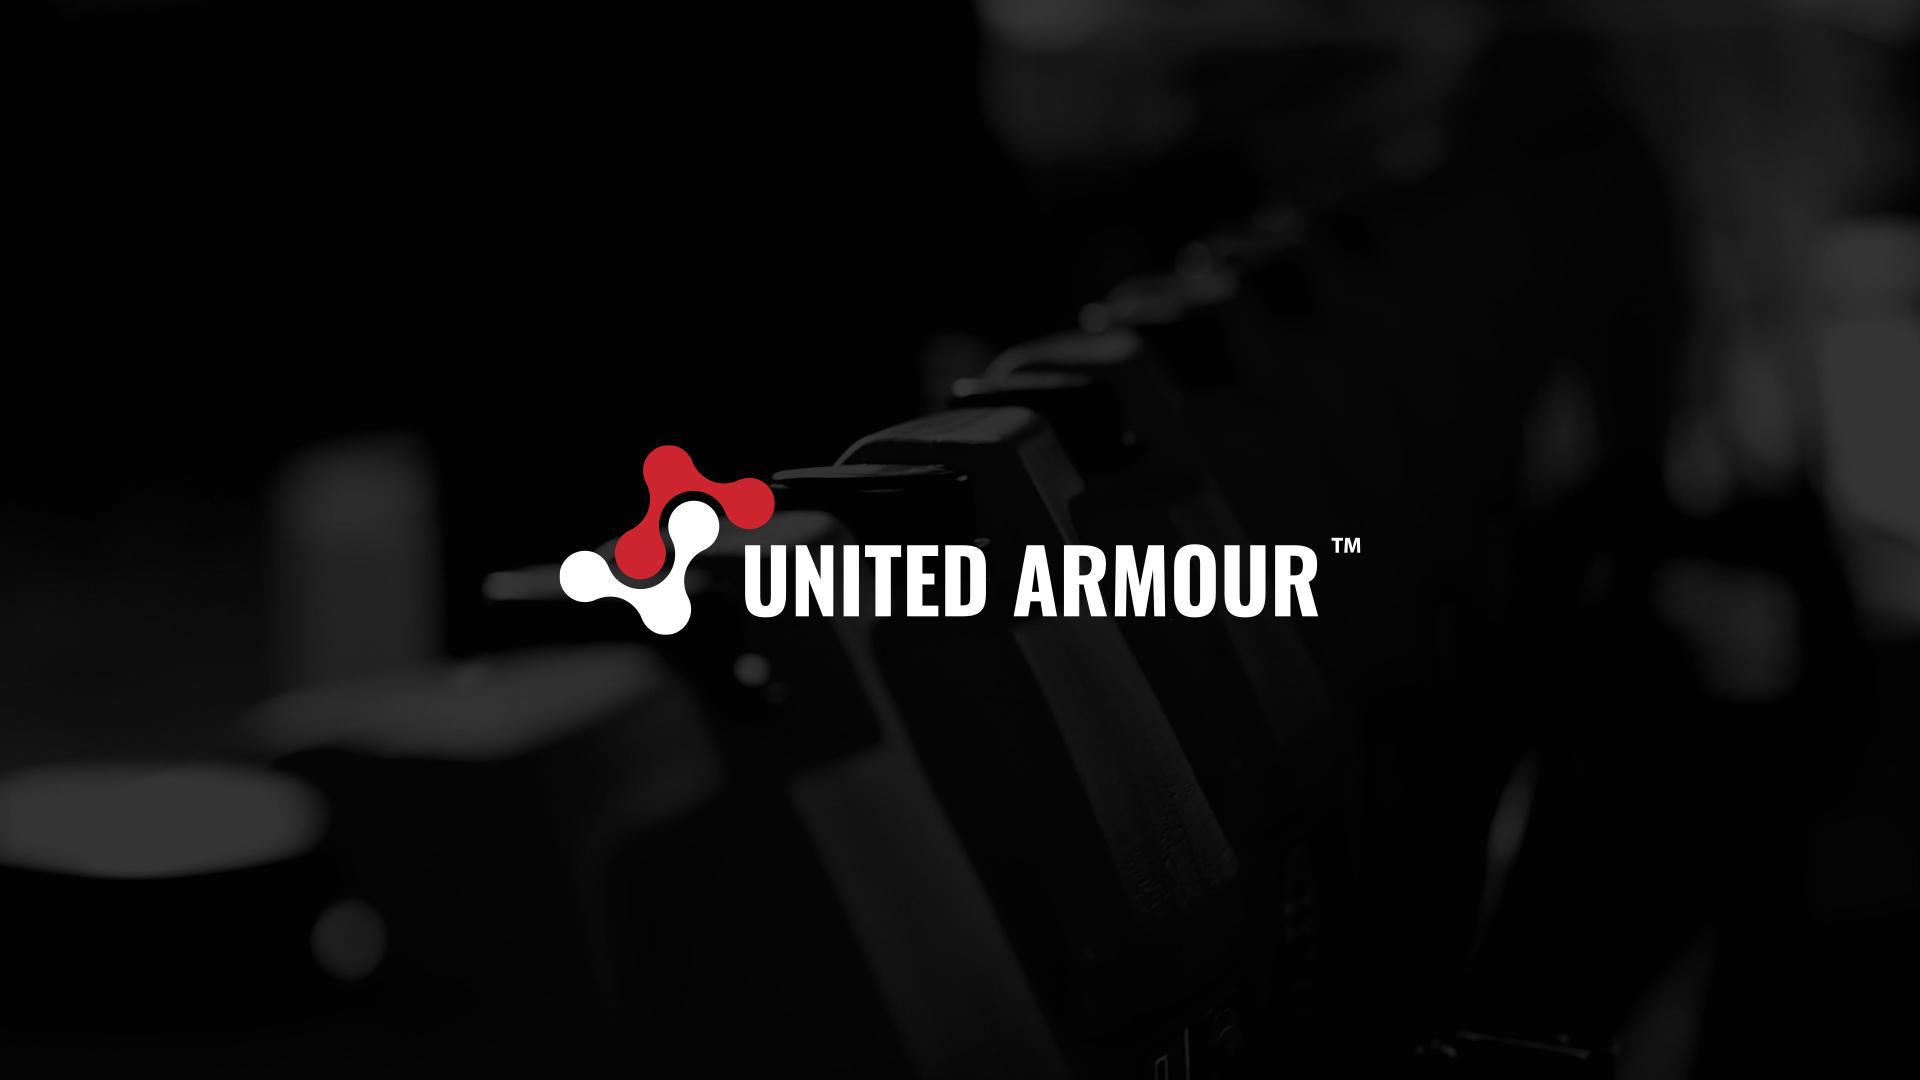 united armour logo